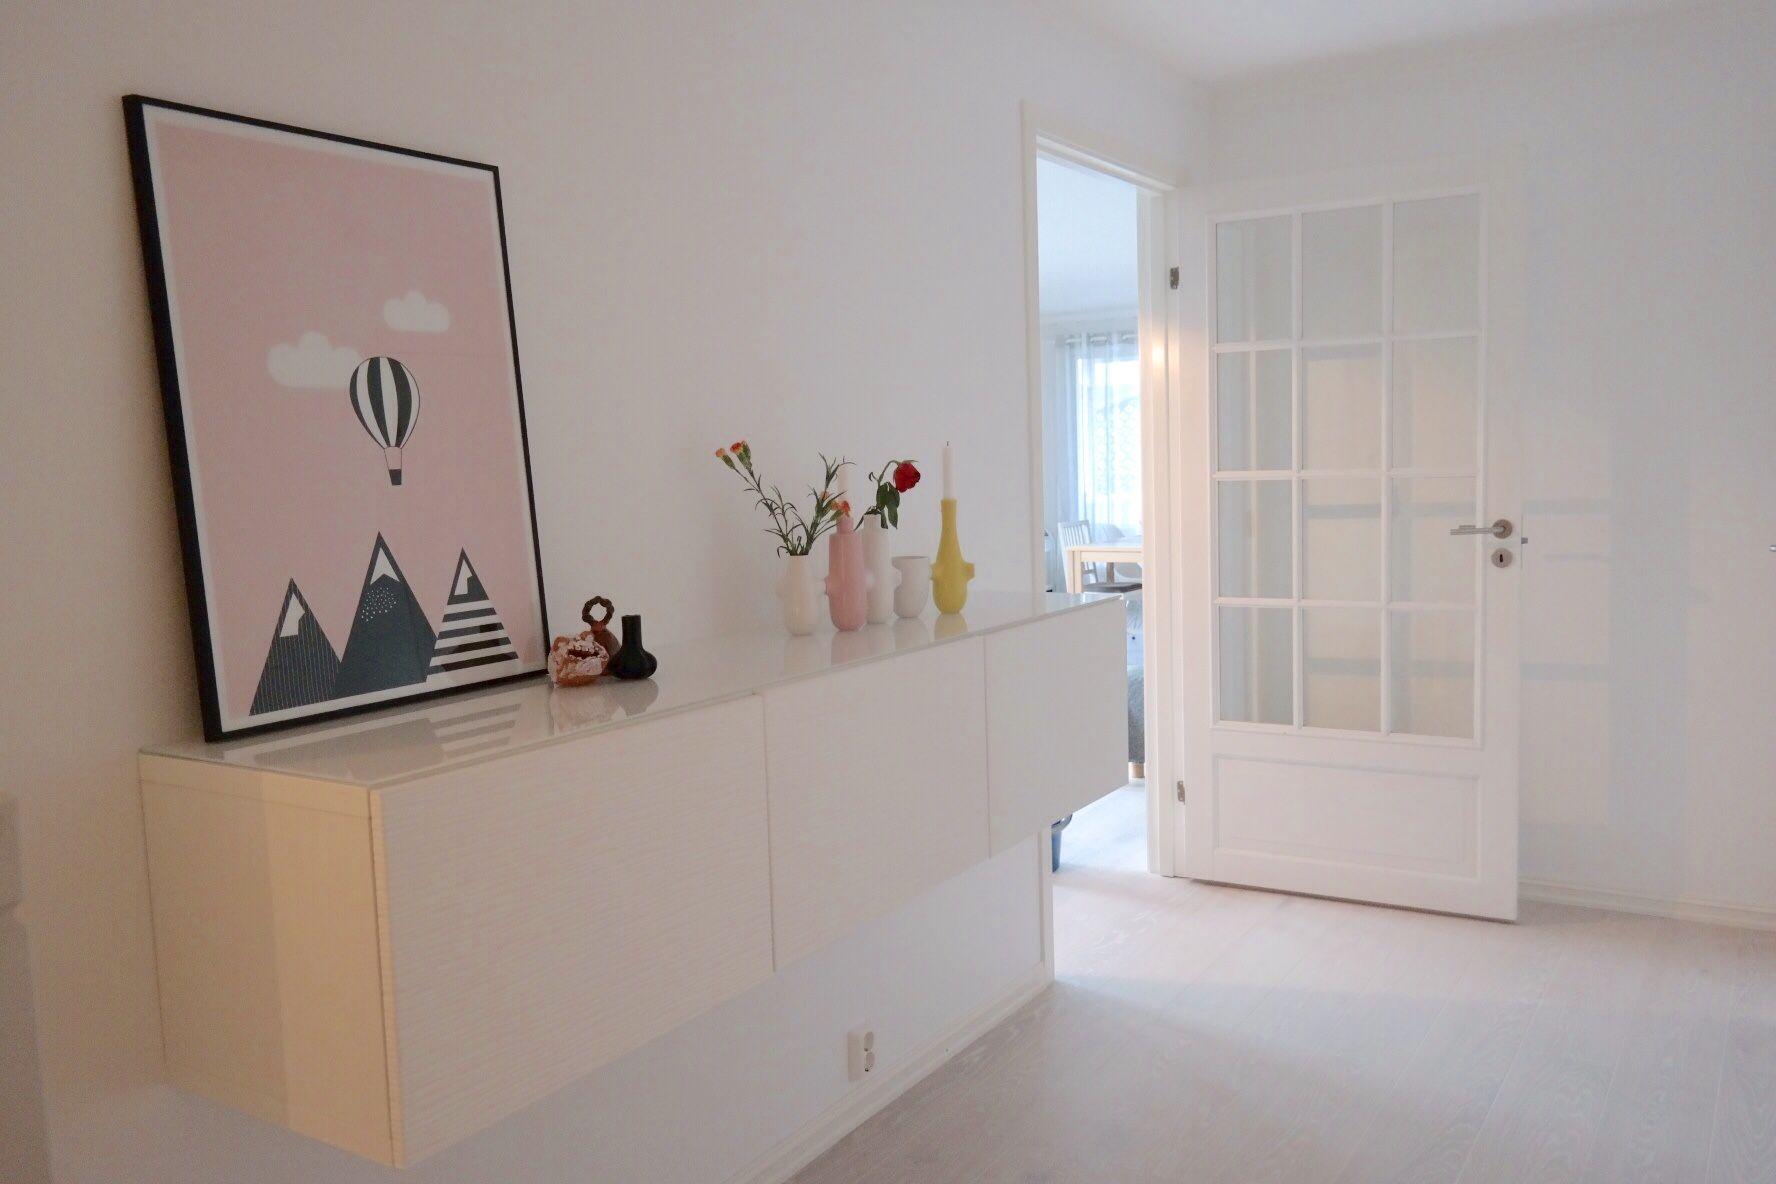 In my hall | entry | ikea | kahler